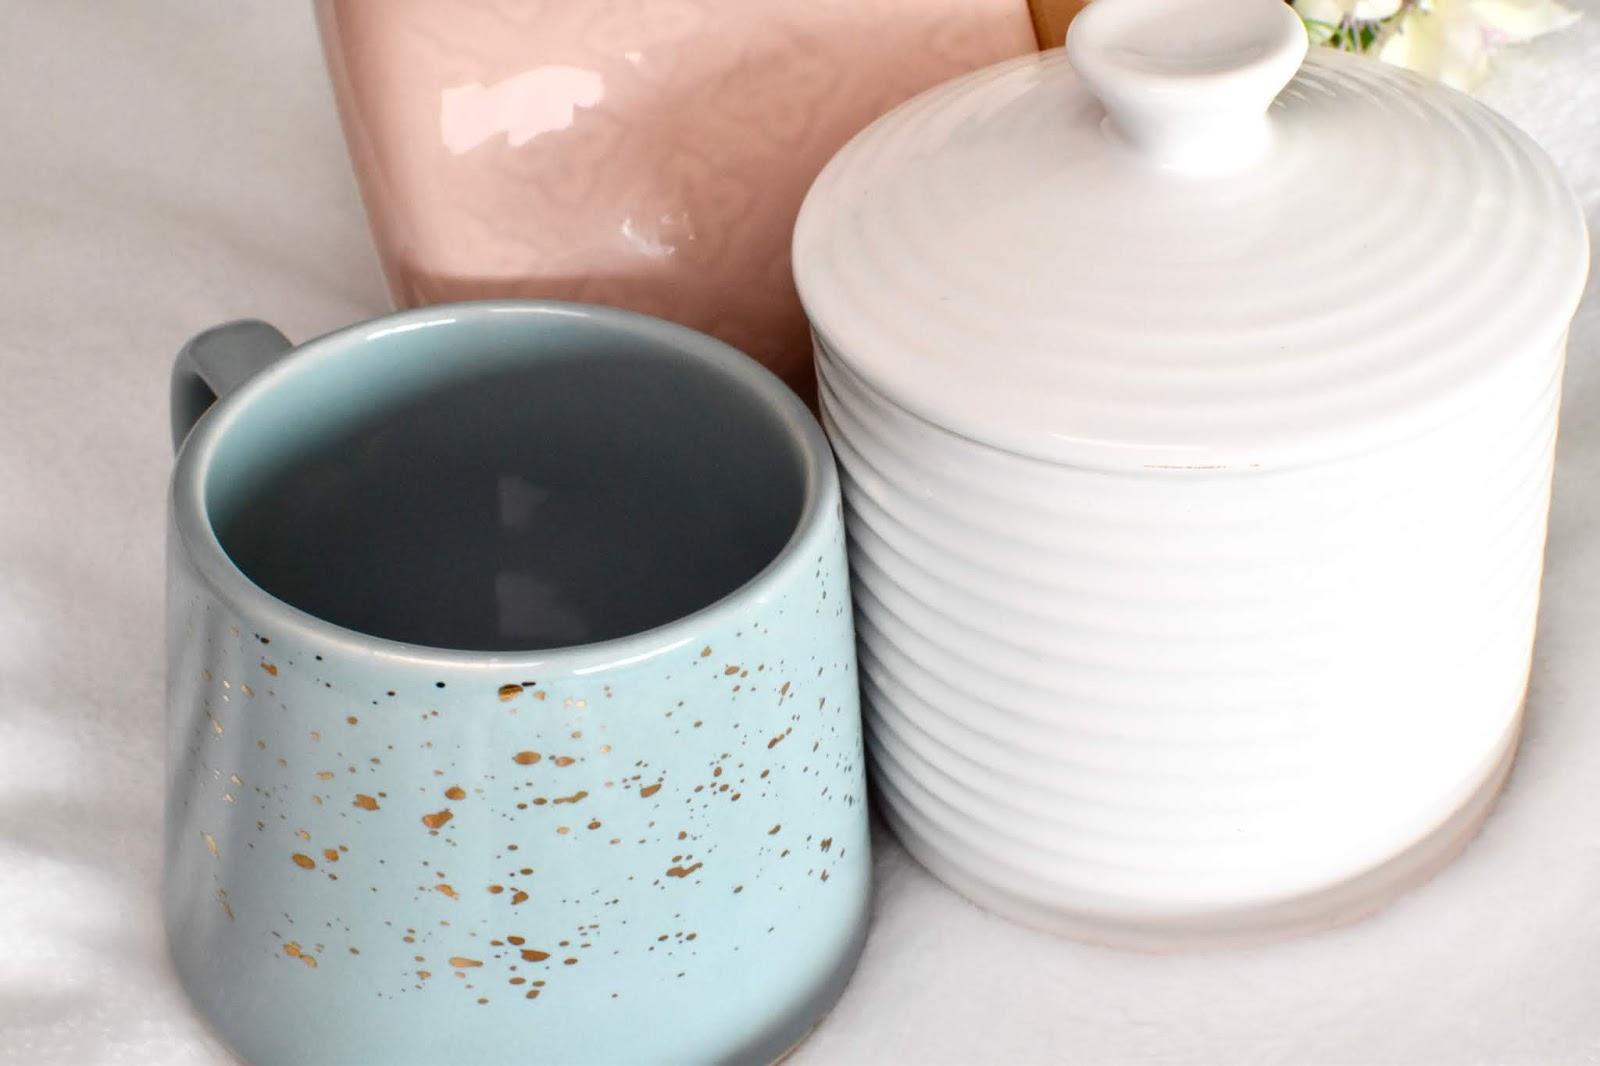 Blue Speckled Mug from TK Maxx